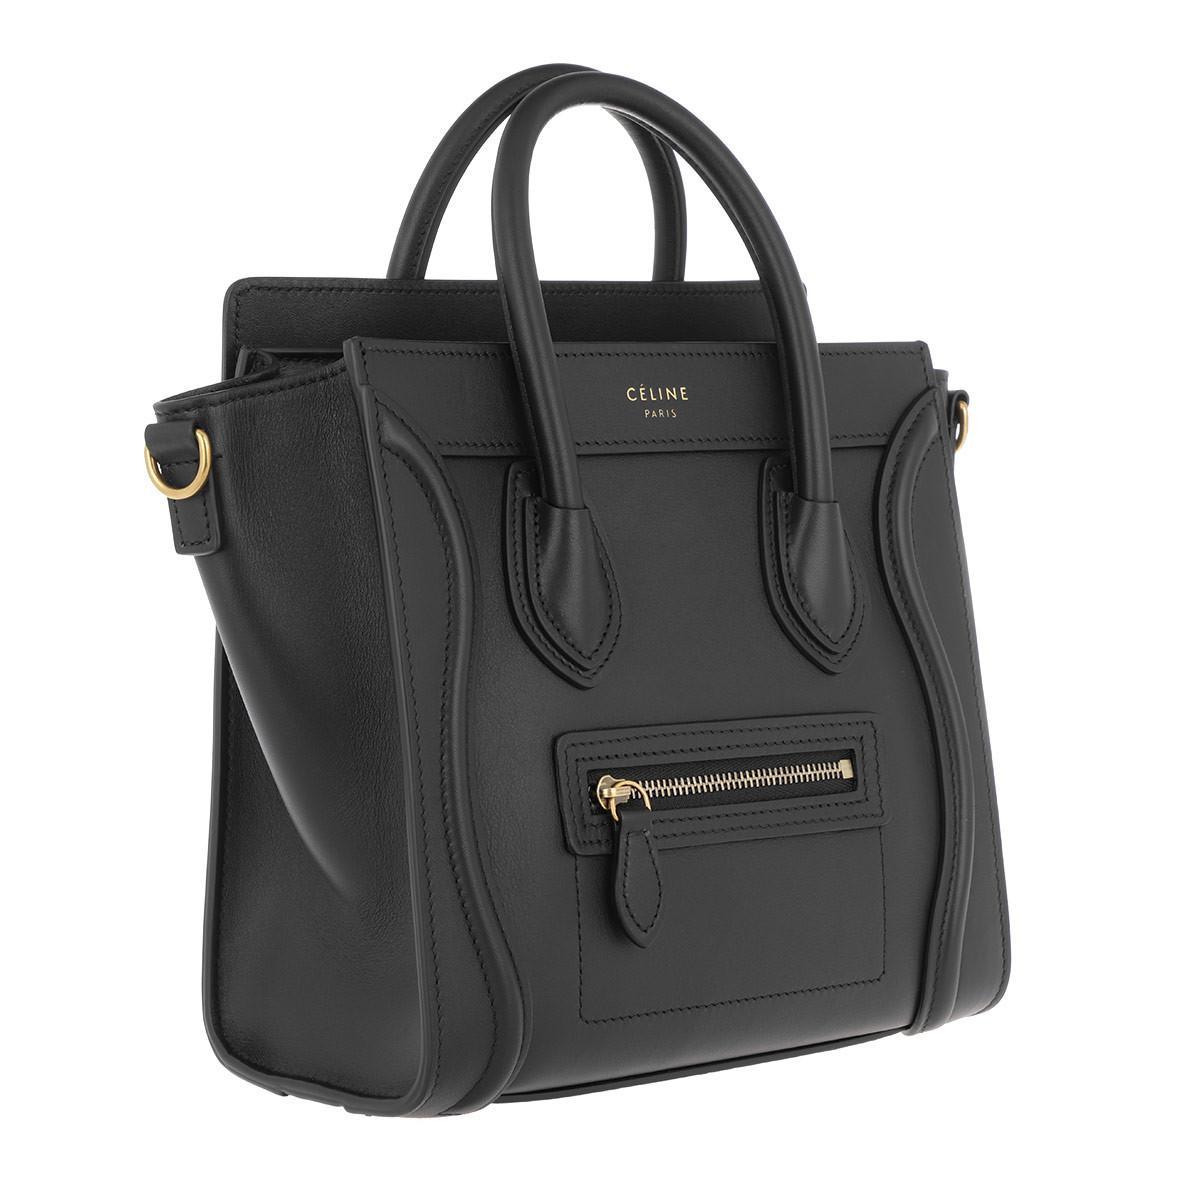 cb85dc48a4d4 Céline Autch Luggage Nano Shopper 2way Leather Black in Black - Lyst